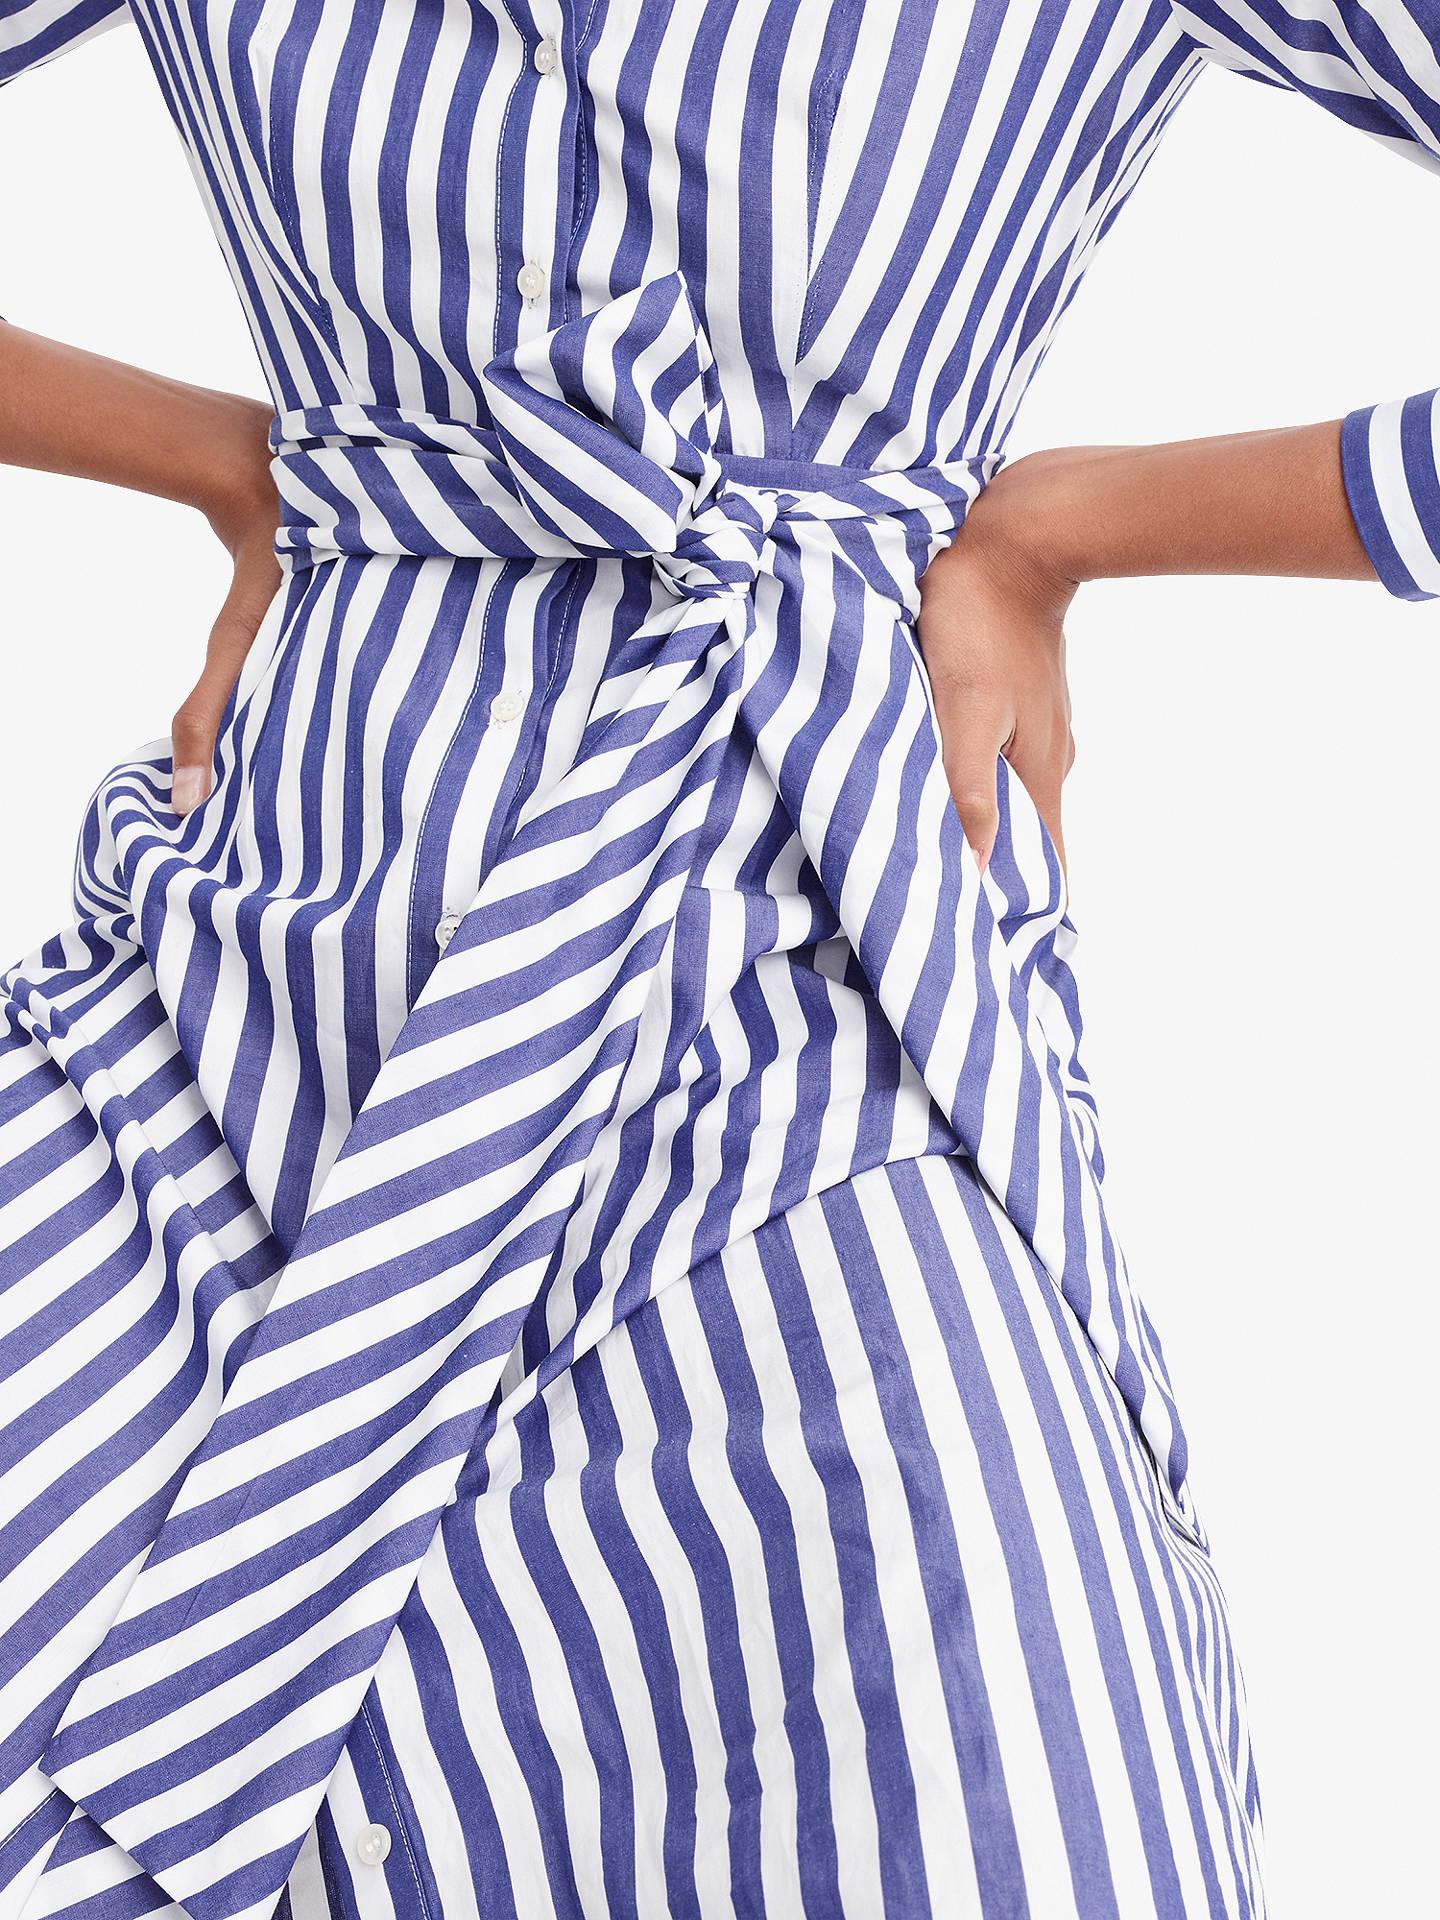 977a6c8e7 ... Buy J.Crew Sybil Tie Waist Shirt Dress, Tushar Stripe Lighthouse, 2  Online